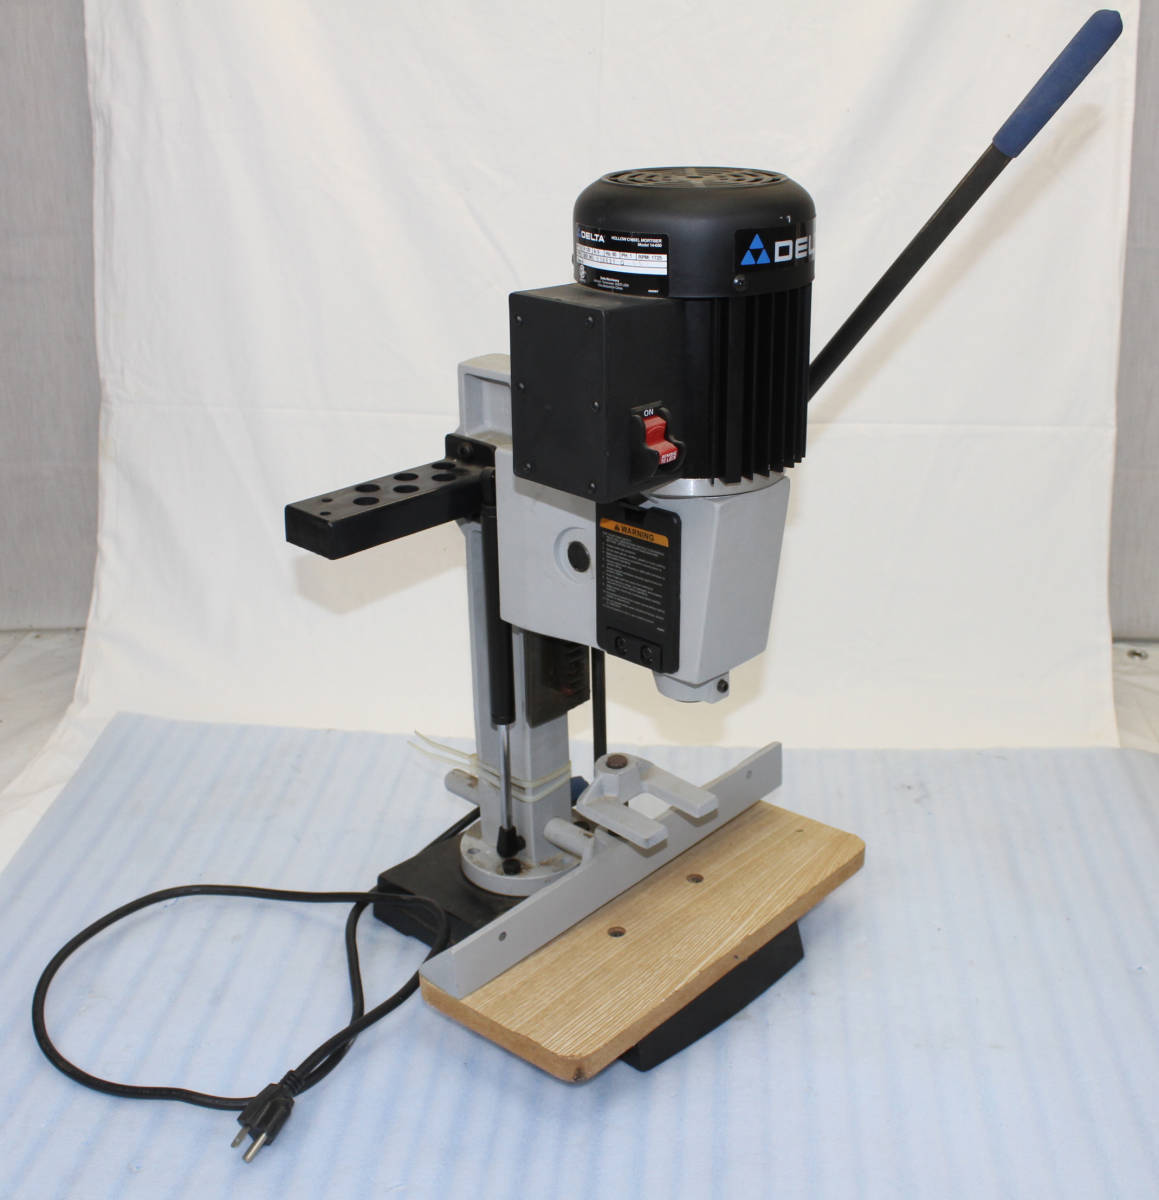 「DELTA HOLLOW CHISEL MORTISER 14-650 デルタ 角のみ盤 アメリカ製 (木工用 切断機 その他)」の画像